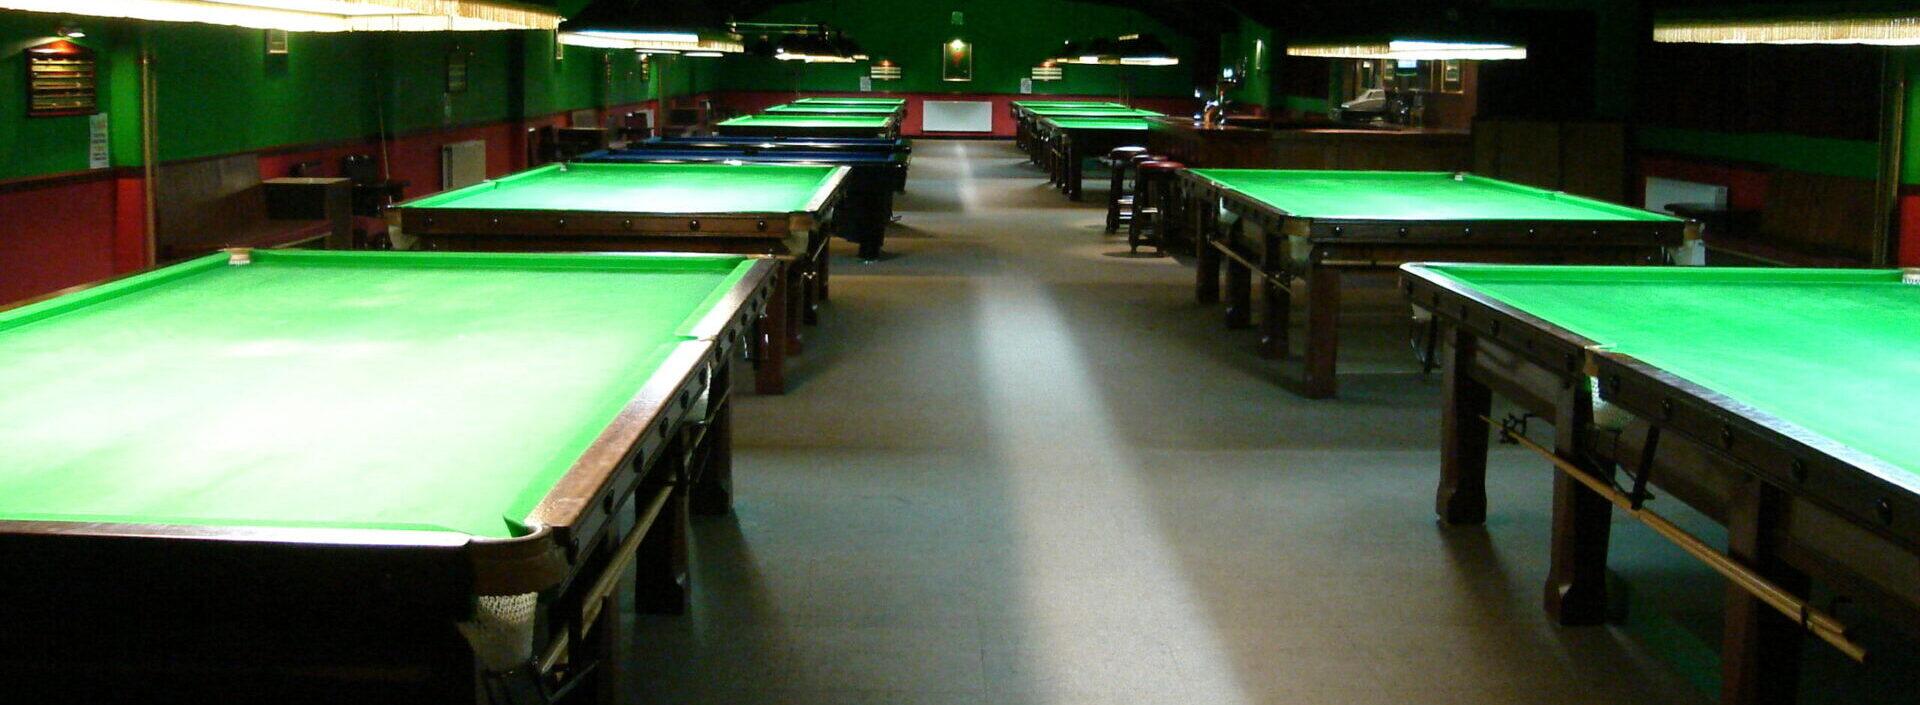 Thame Snooker Club